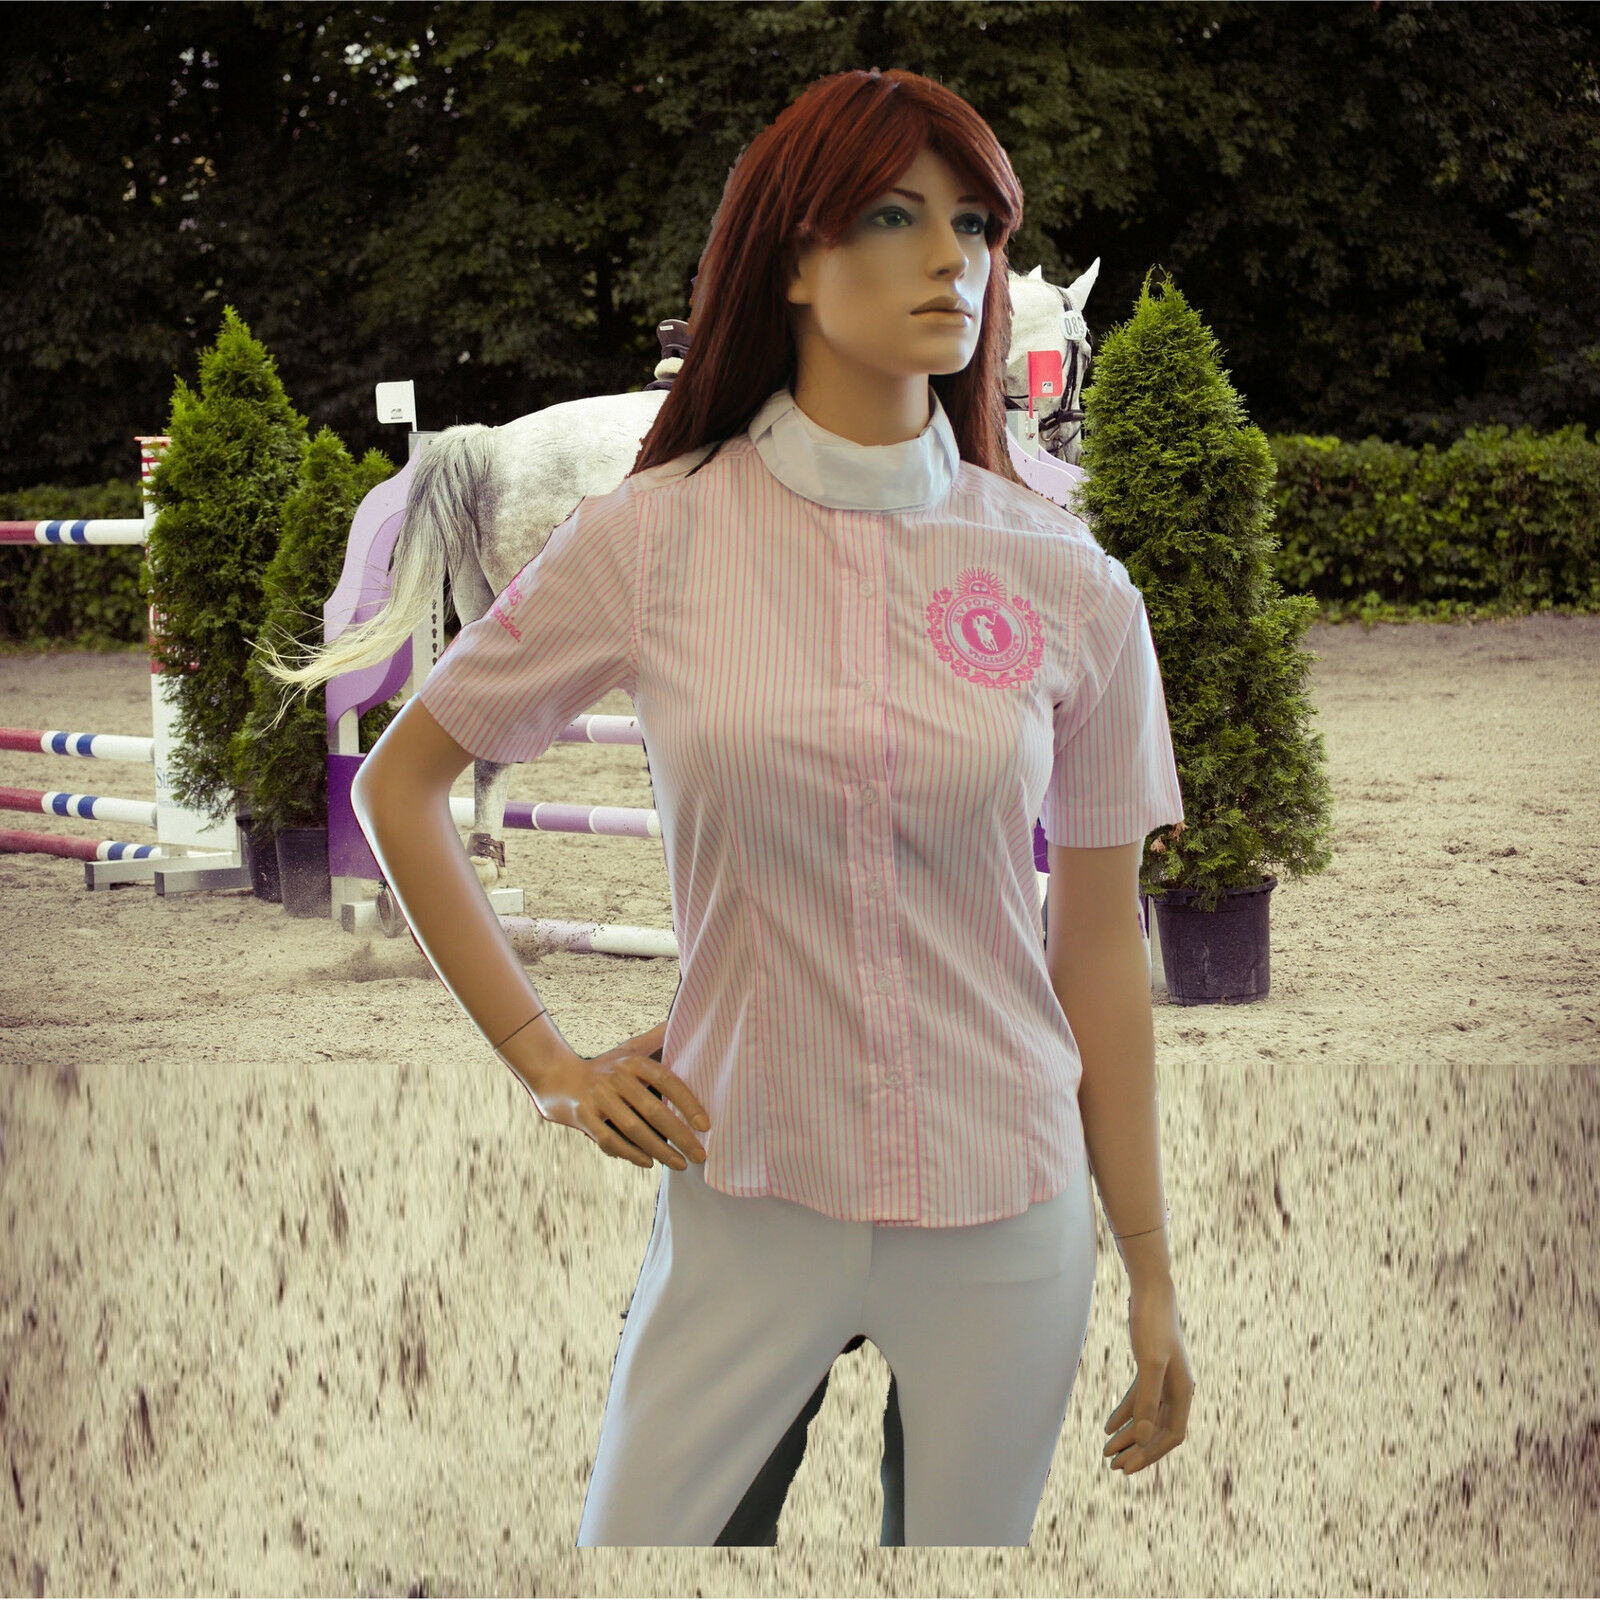 HV Polo Damen Turnier Blause Savine, Rosa Streifen, Turnierbekleidung, Turnierbekleidung, Turnierbekleidung, Gr. XS 74d9de